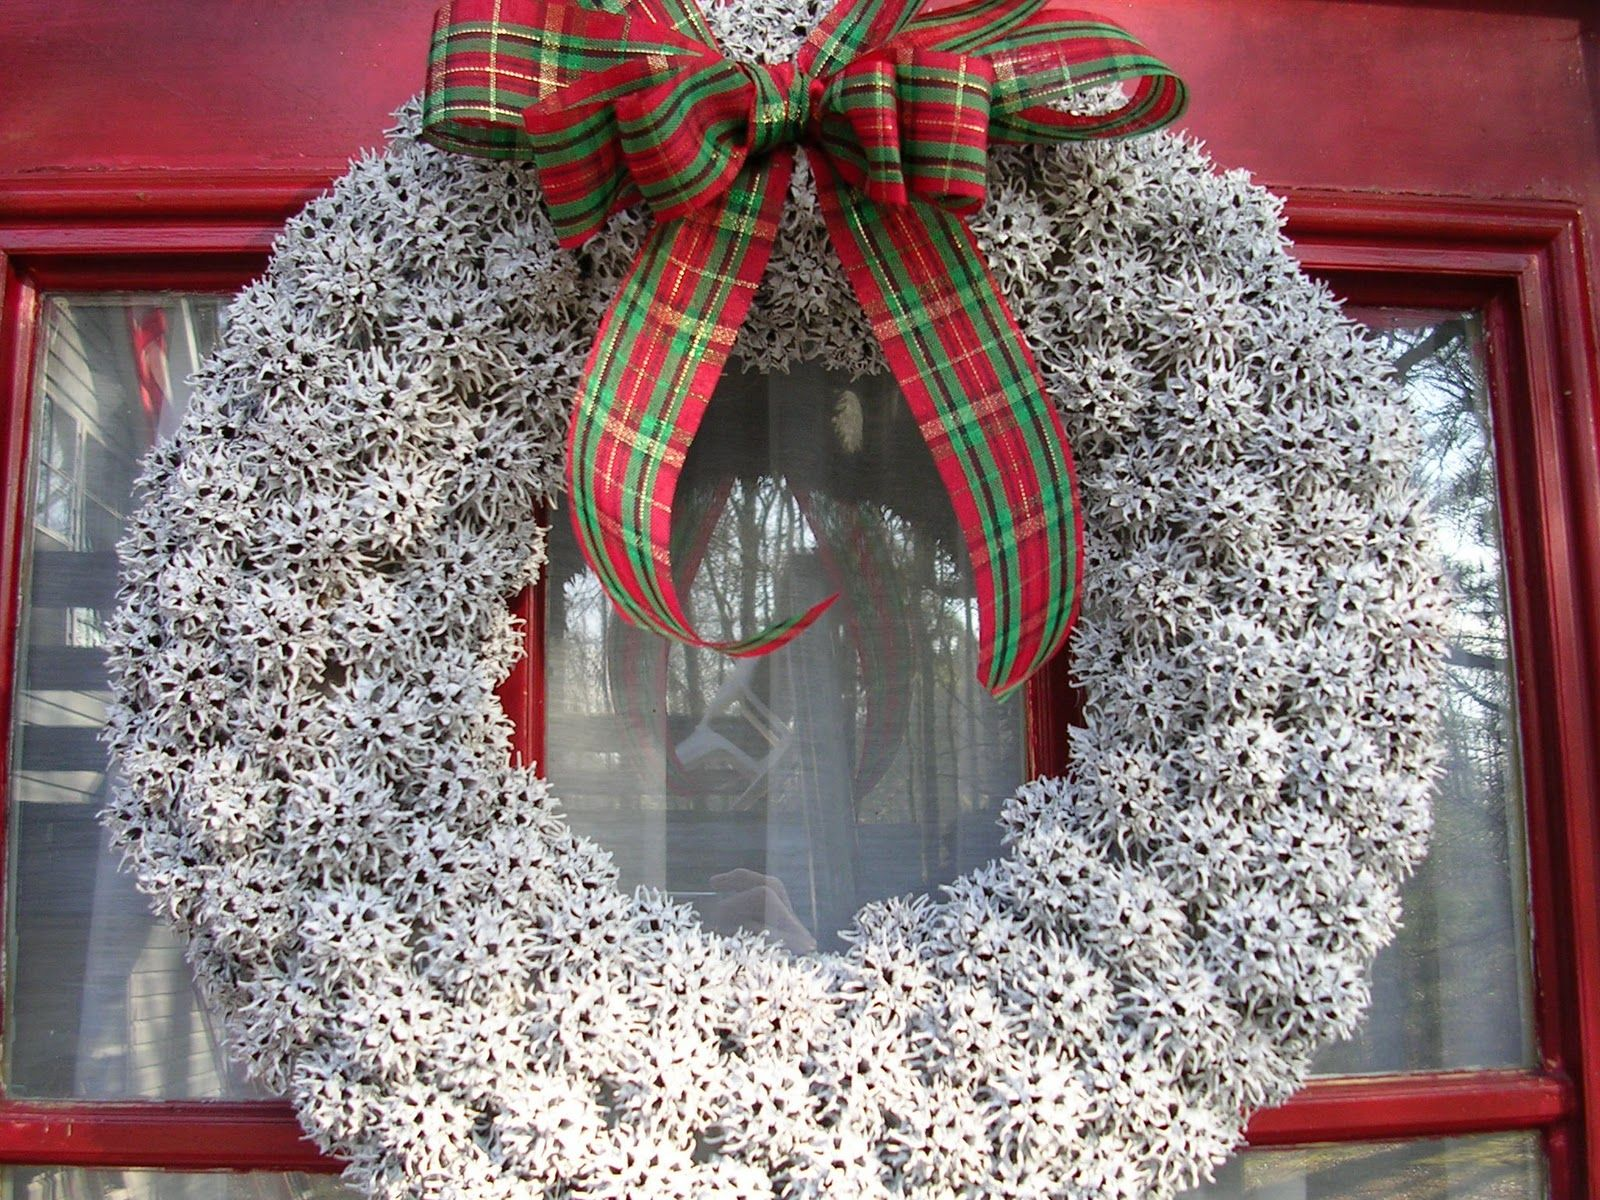 Sweet Gum Wreath Christmas Crafts Decorations Sweet Gum Tree